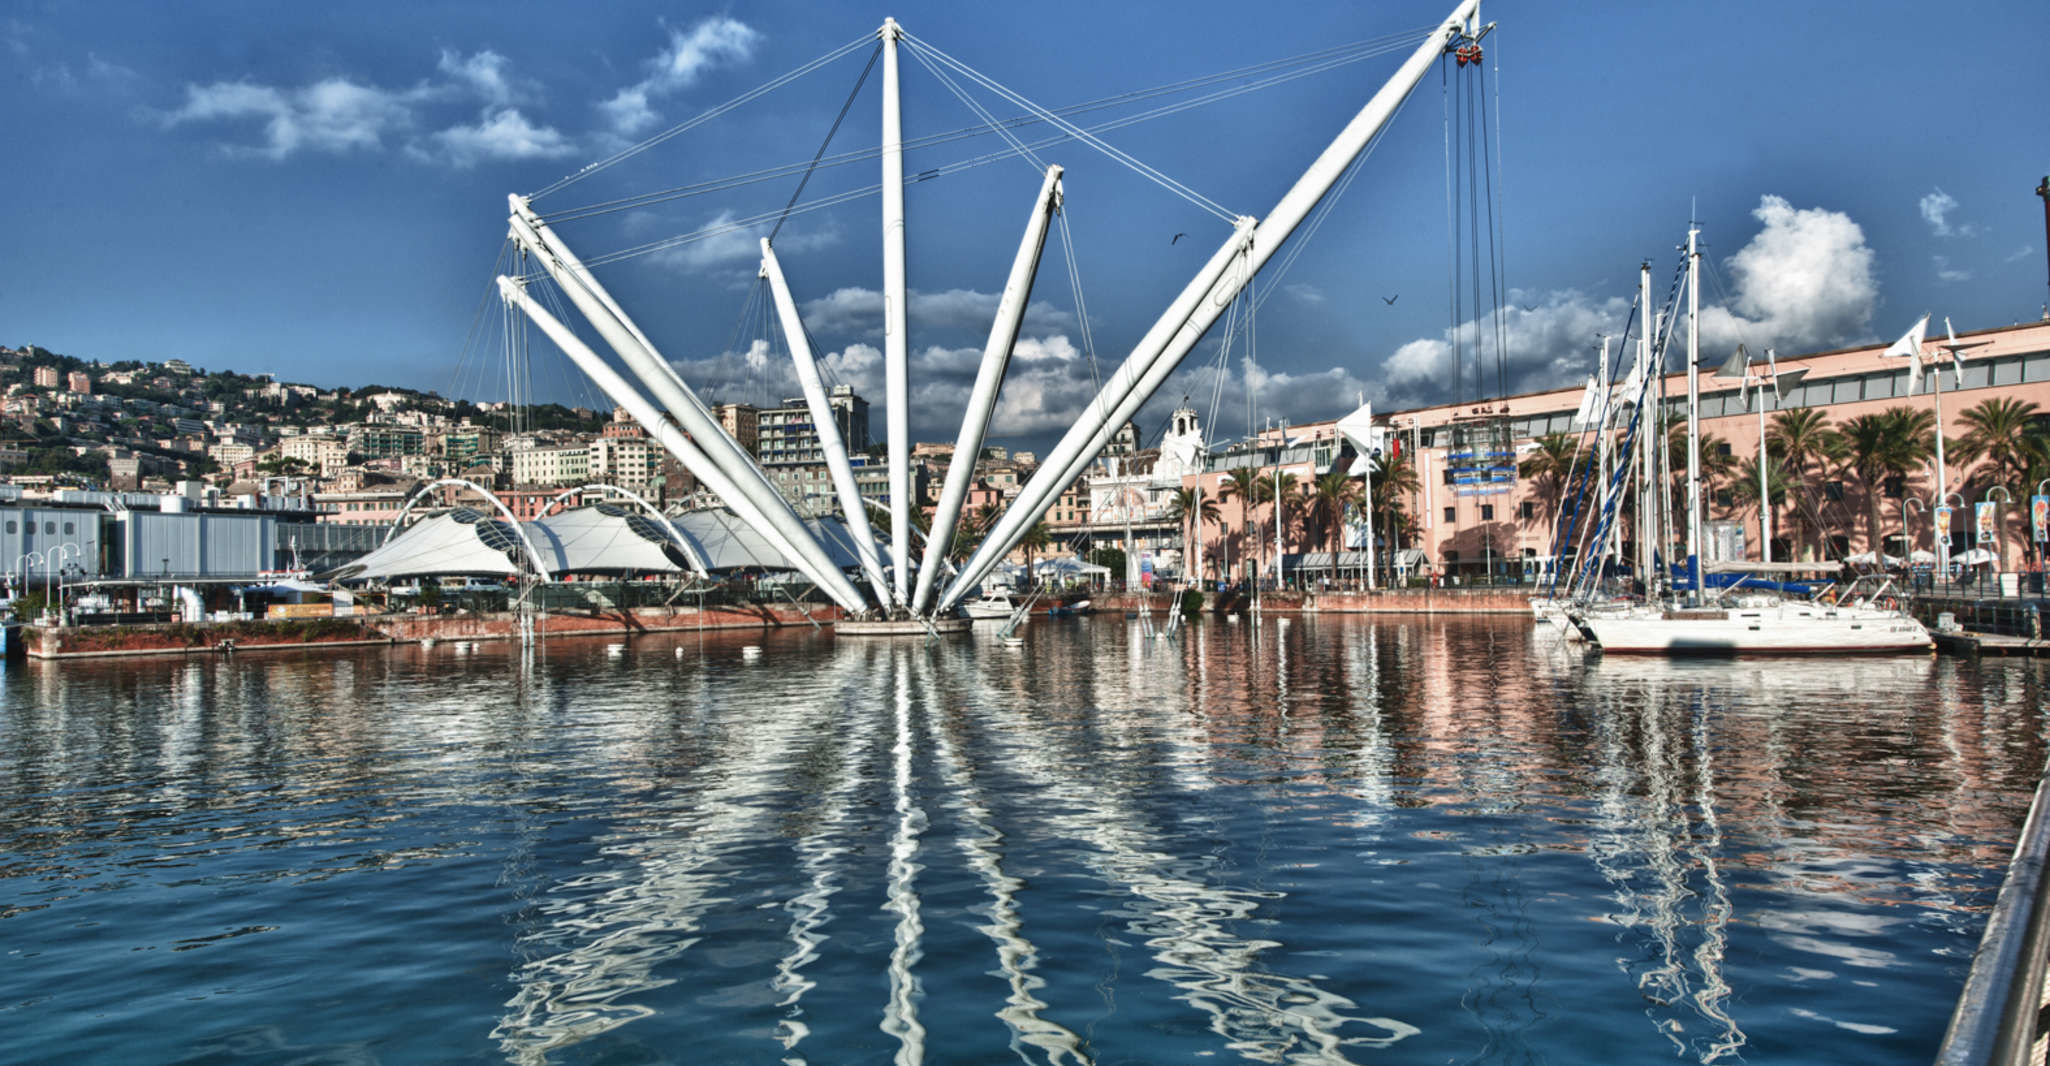 Porto Antico: Bigo Panoramic Lift